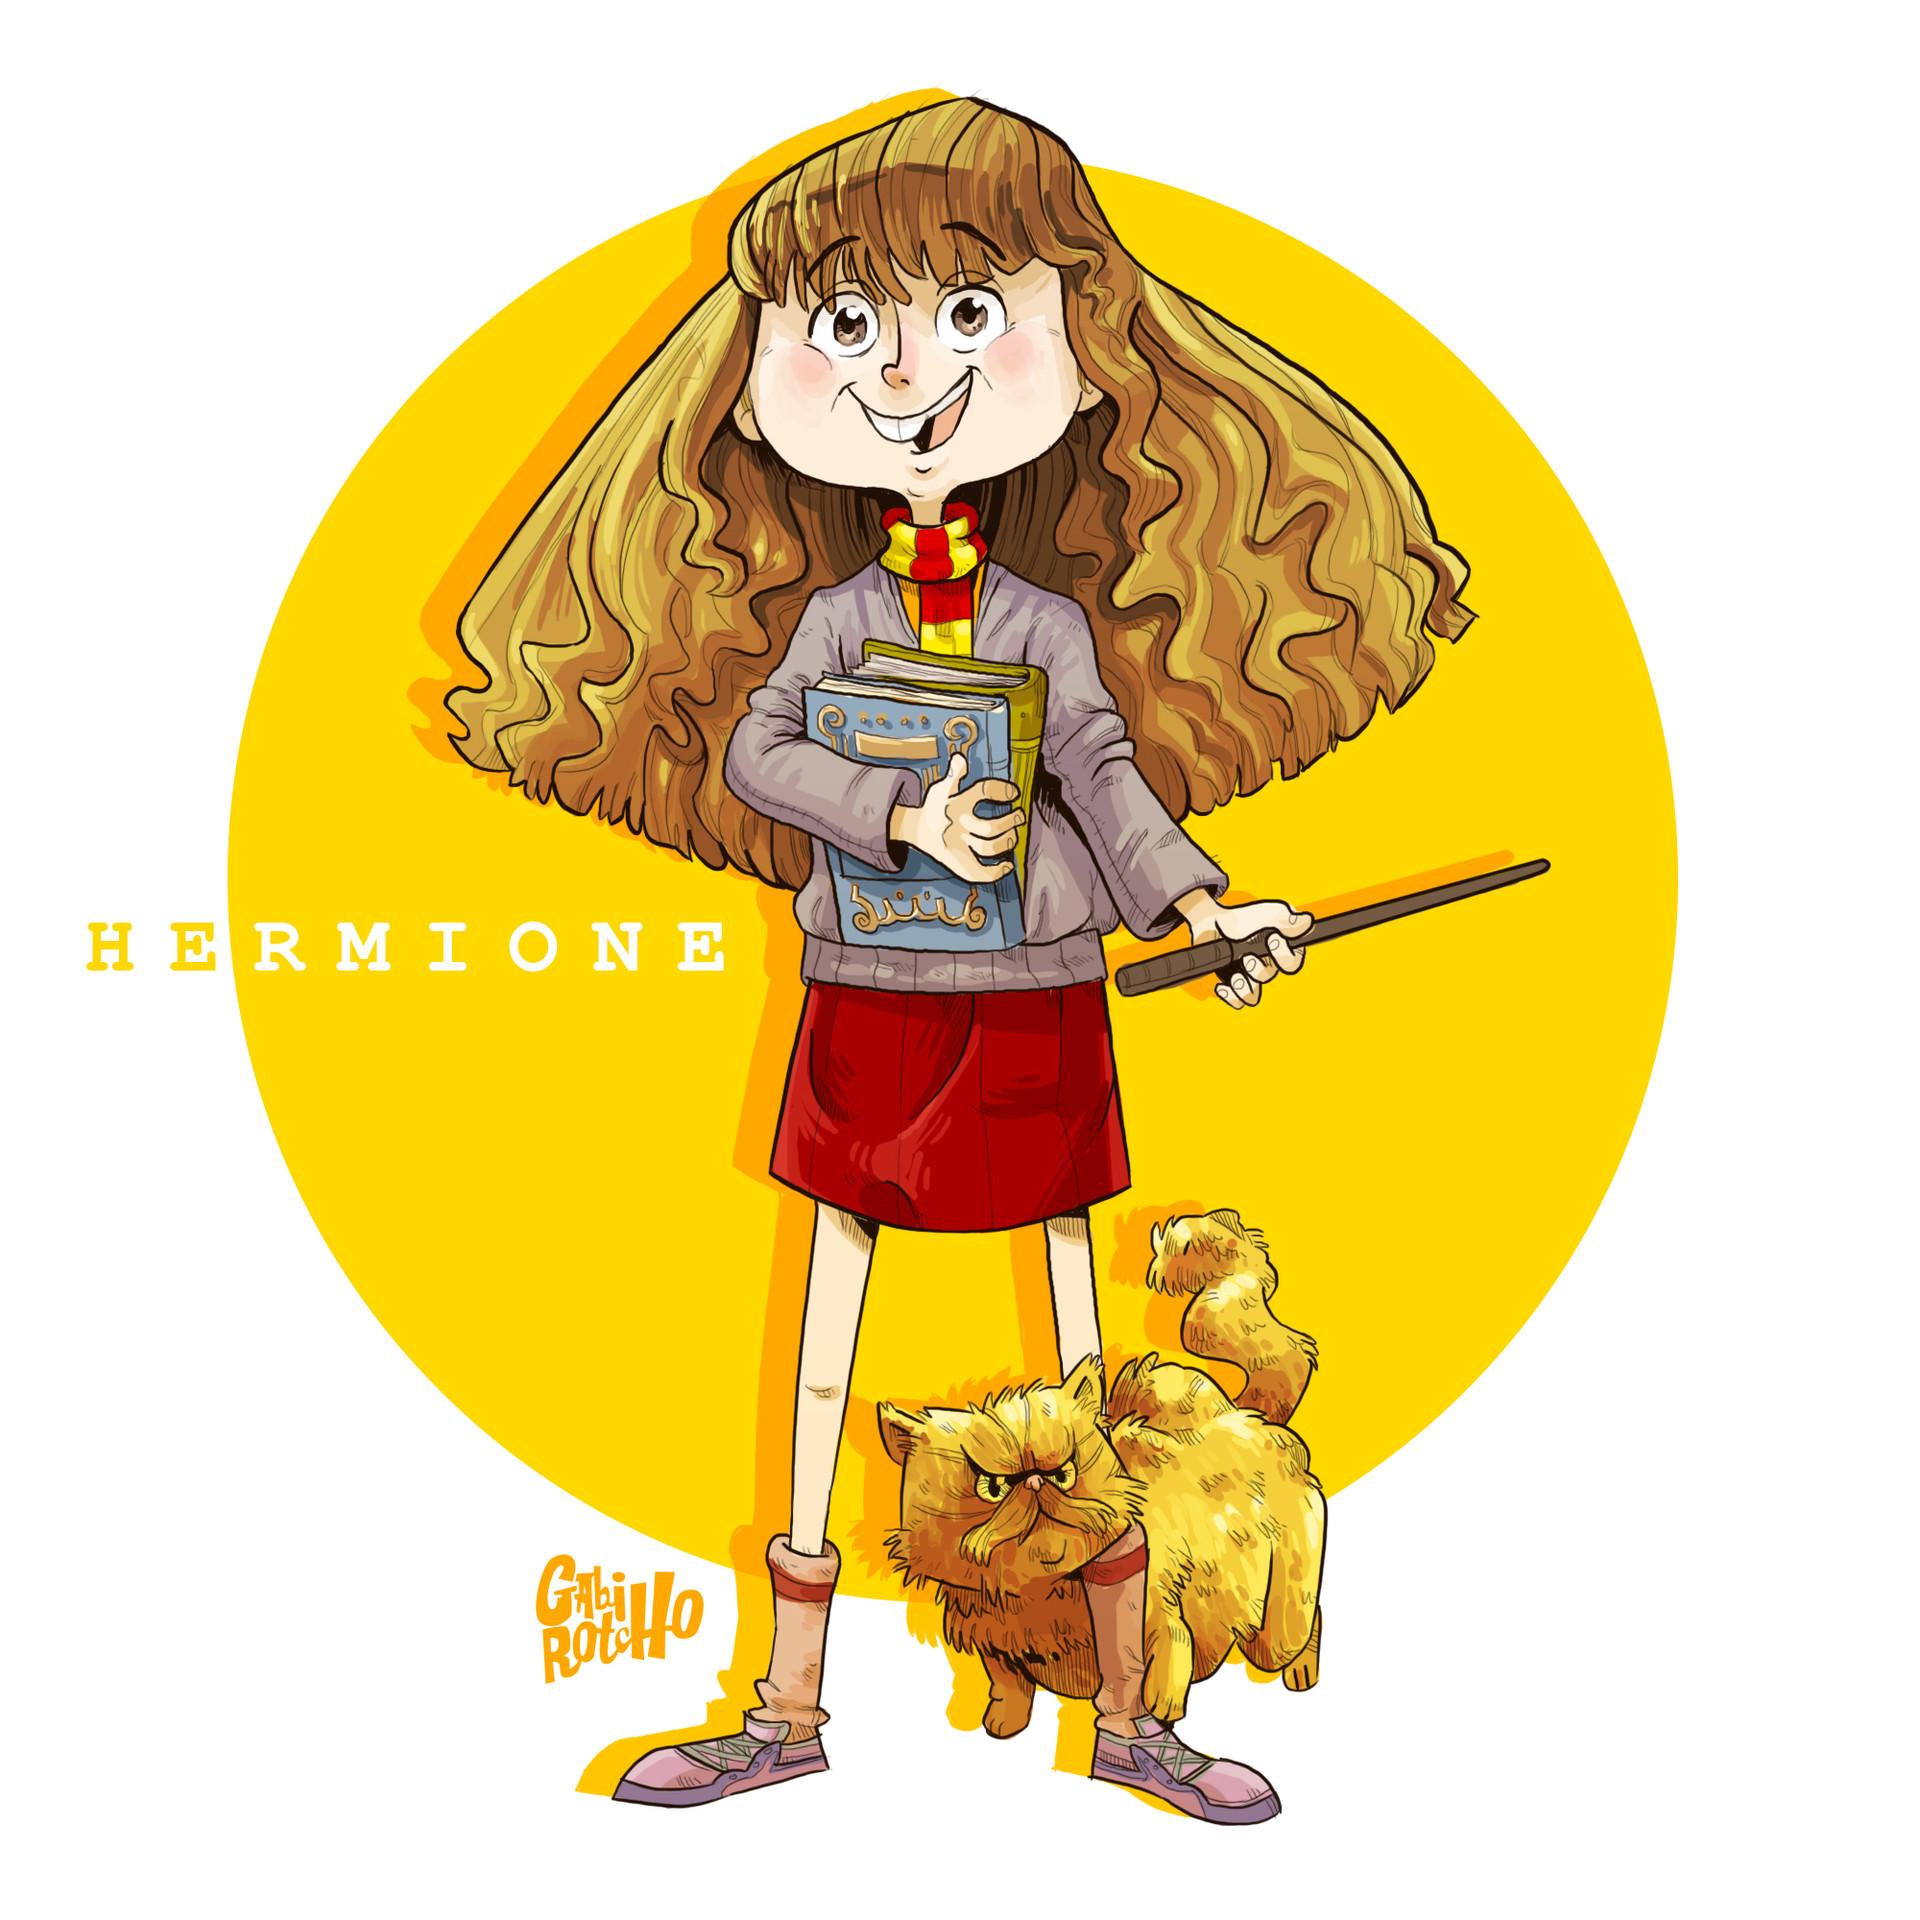 Gabirotcho hermione